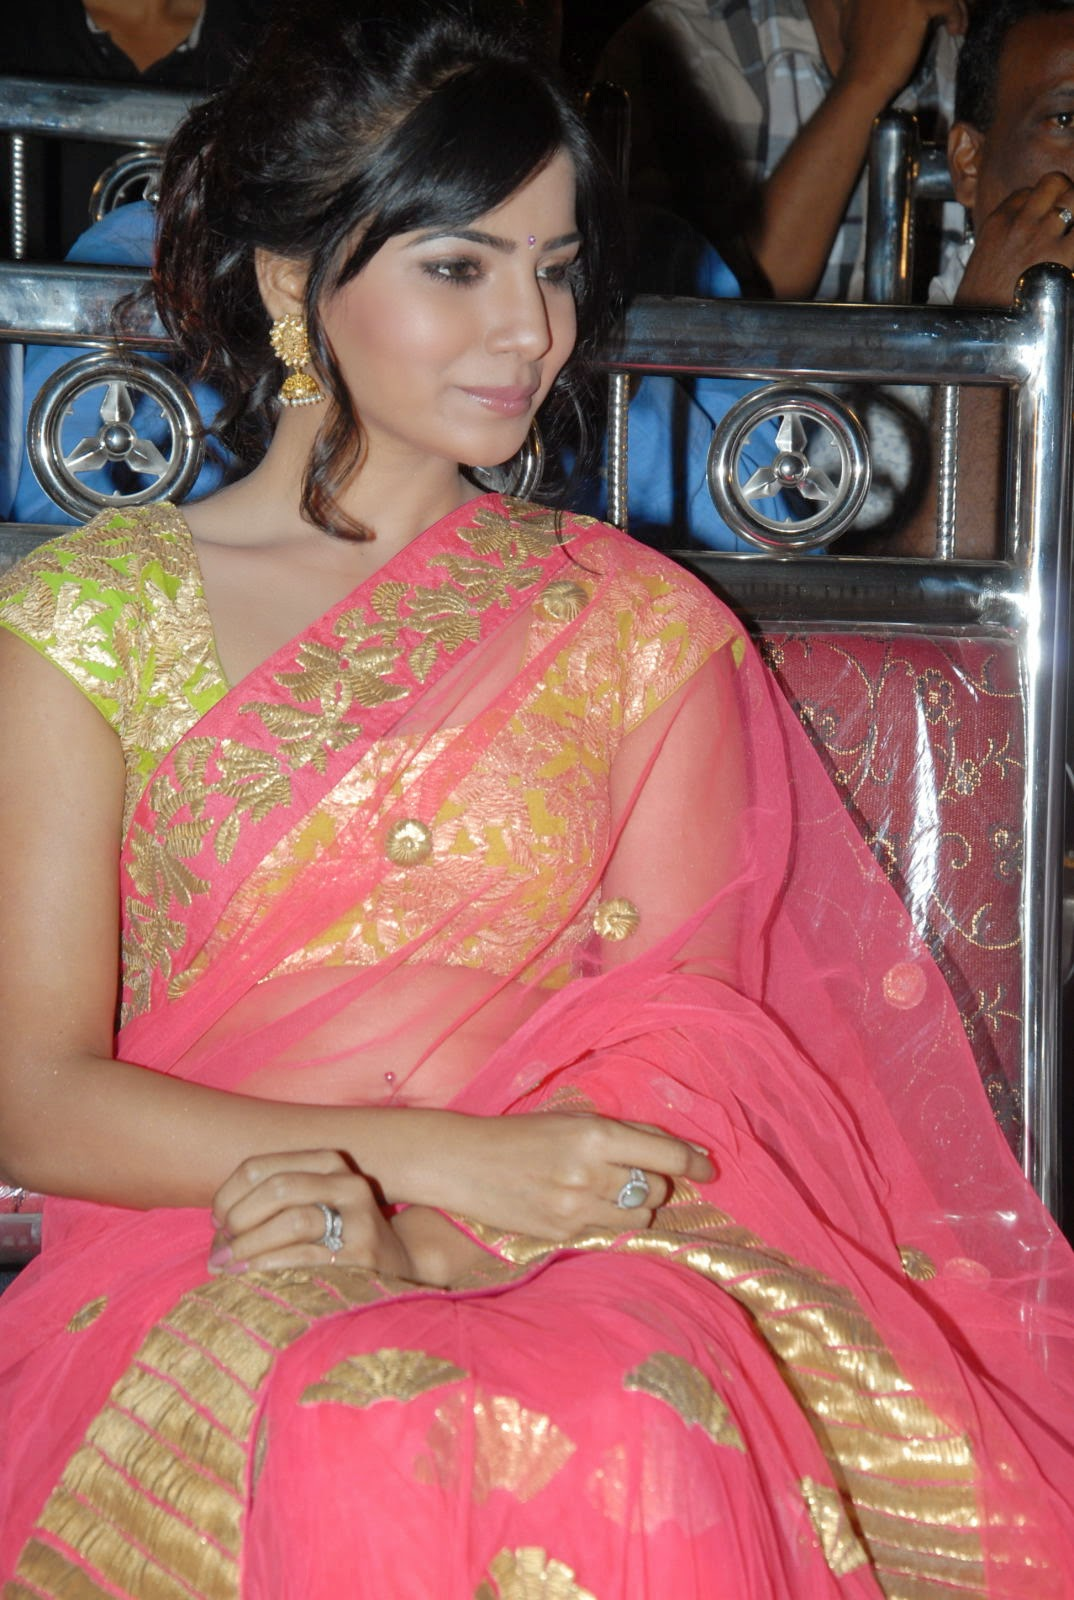 Samantha Cute Saree Hd Hot Photo Galleryz Indian Actress Hd Galleryz Sunny Leone Sapna